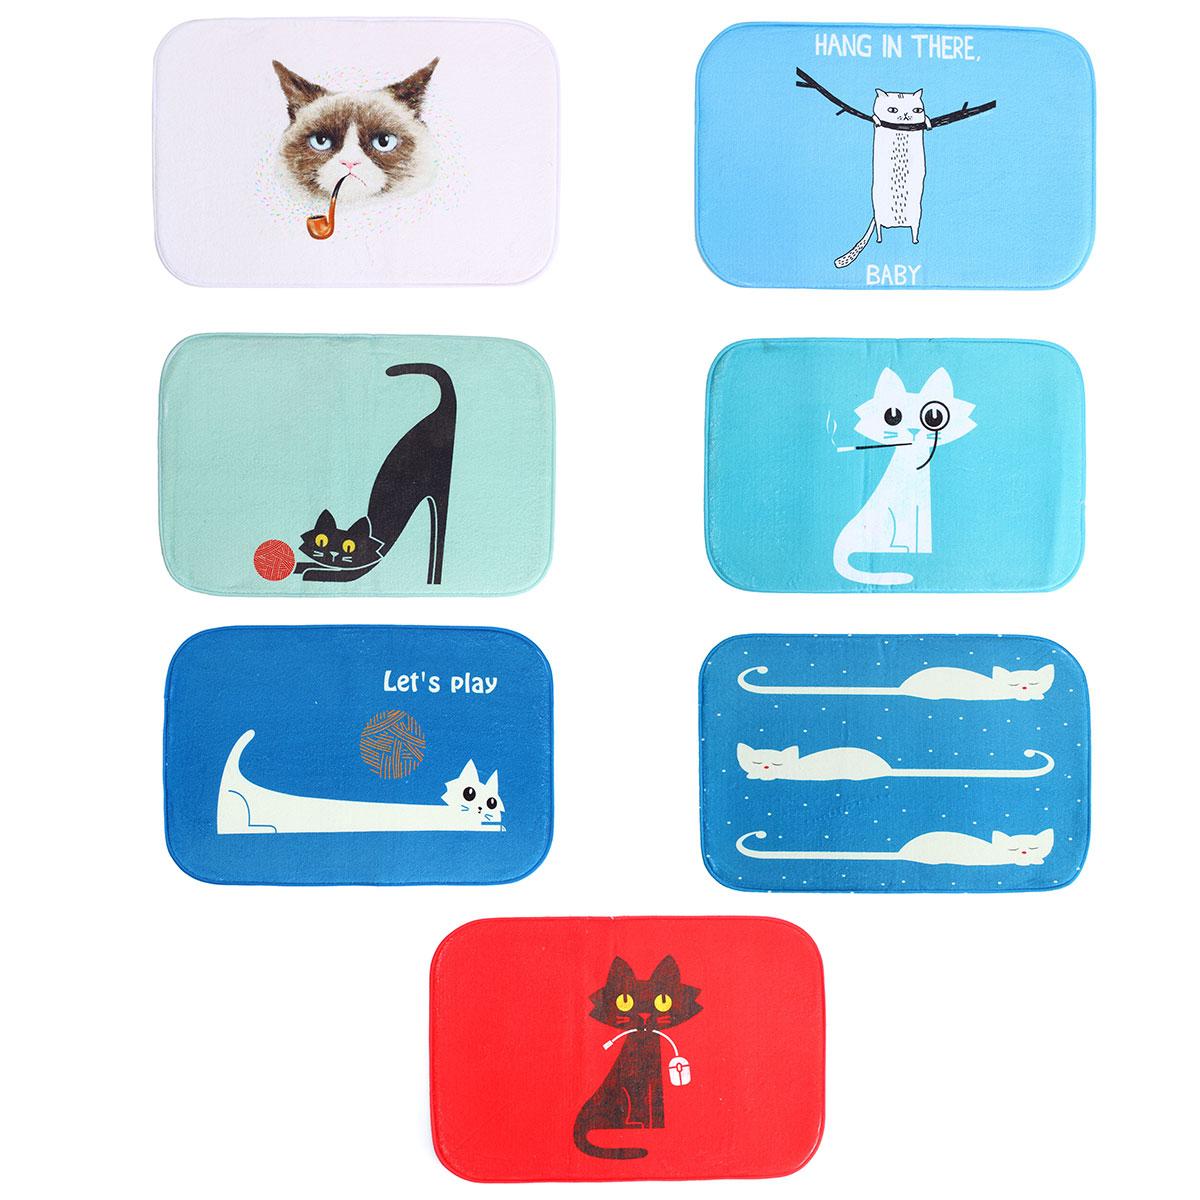 40*60cm Cutie Cat Print Rug Carpet Bathroom Floor Dining Room Door Mat Home Shop Design Decorative Craft(China (Mainland))